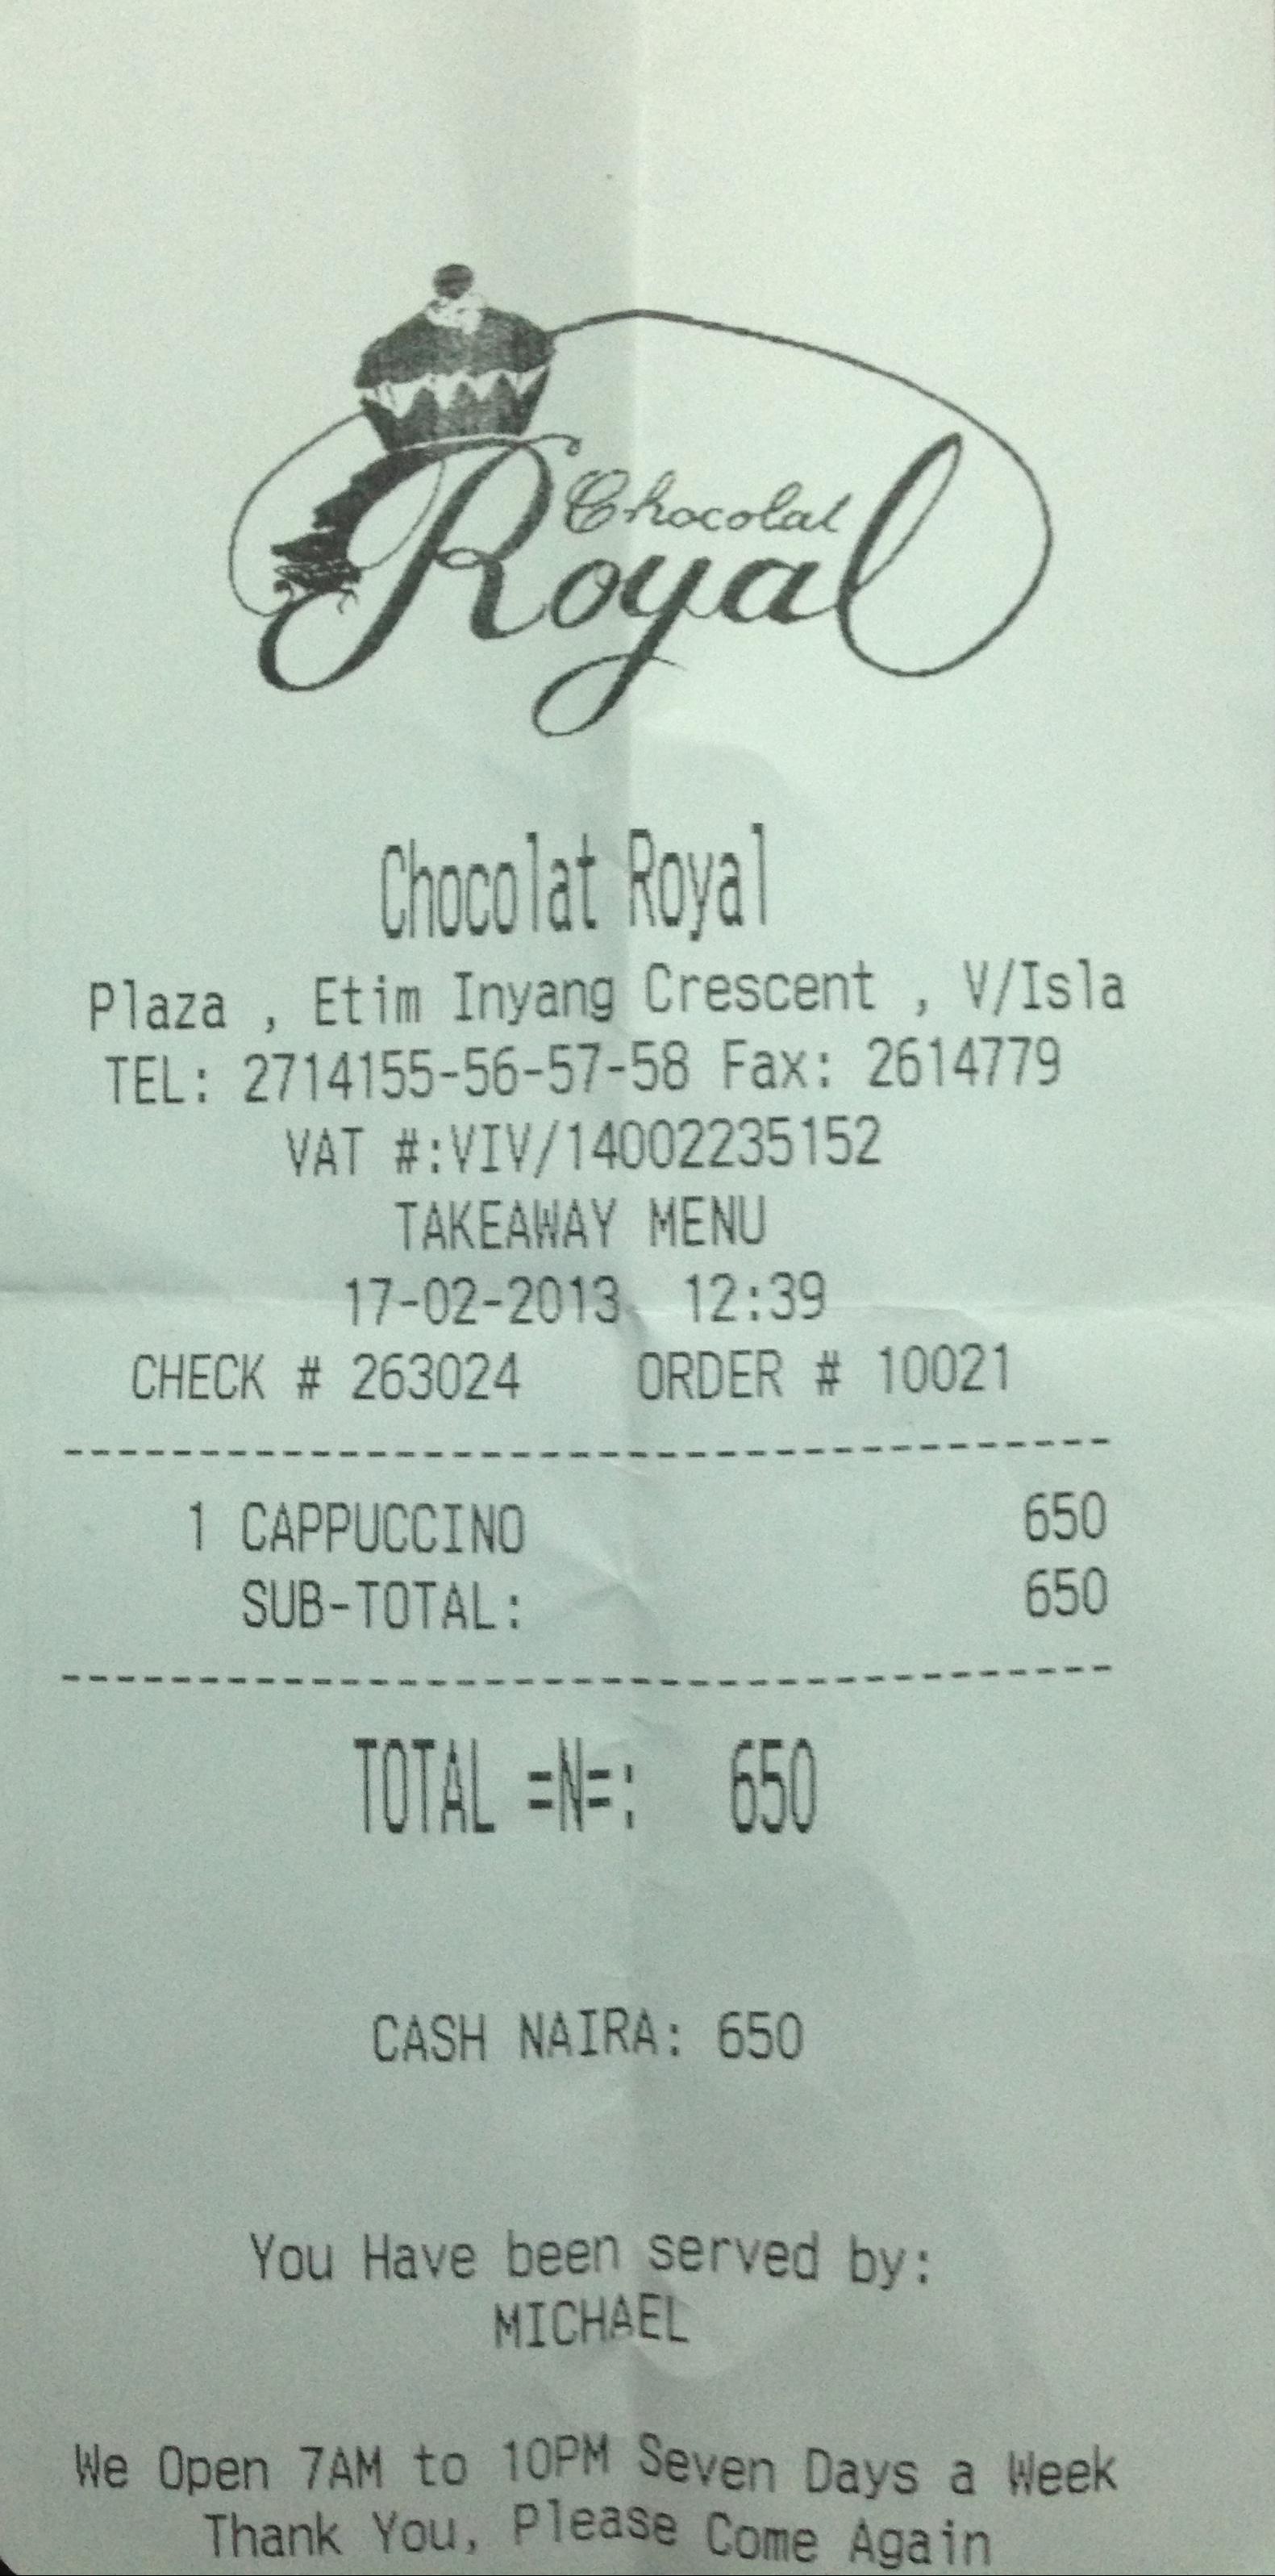 "<img src=http://""Chocolat_Royal_Cappuccino_Receipt.jpg""?w=168&h=338 alt=""Chocolat Royal Cappuccino Receipt"">"